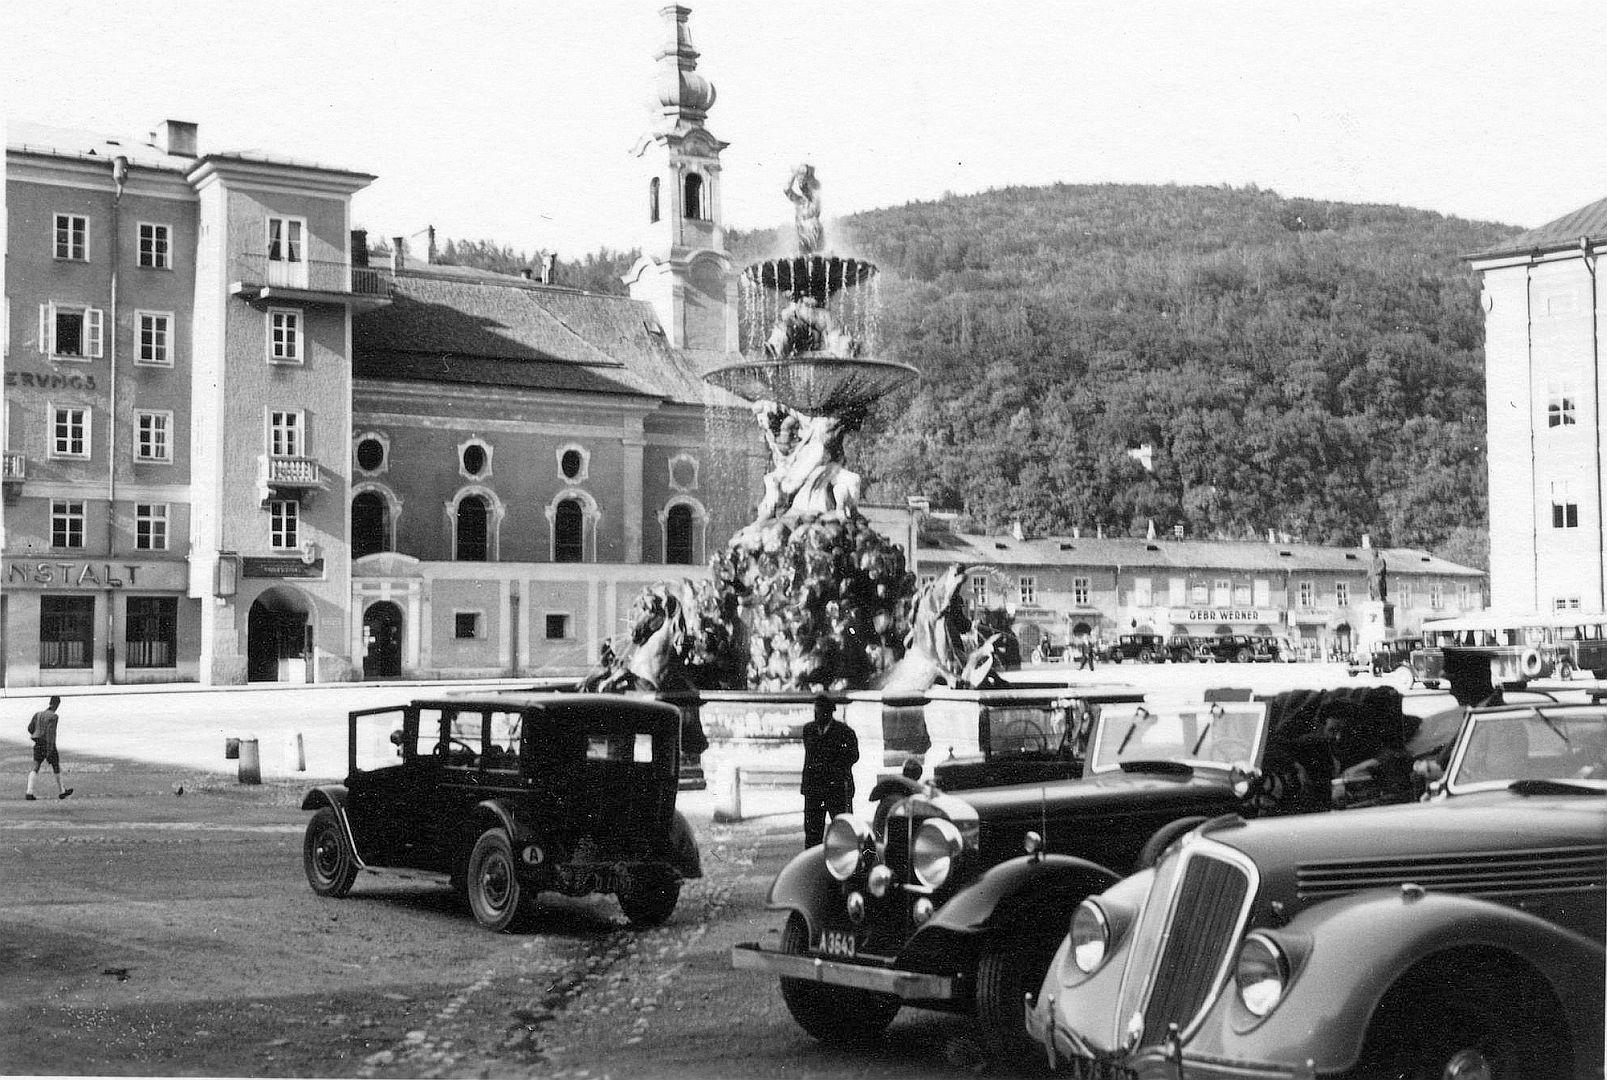 Renault_Viva_oder Nerva_Grand Sport_1936_Salzburg_Residenzplatz_Galerie1